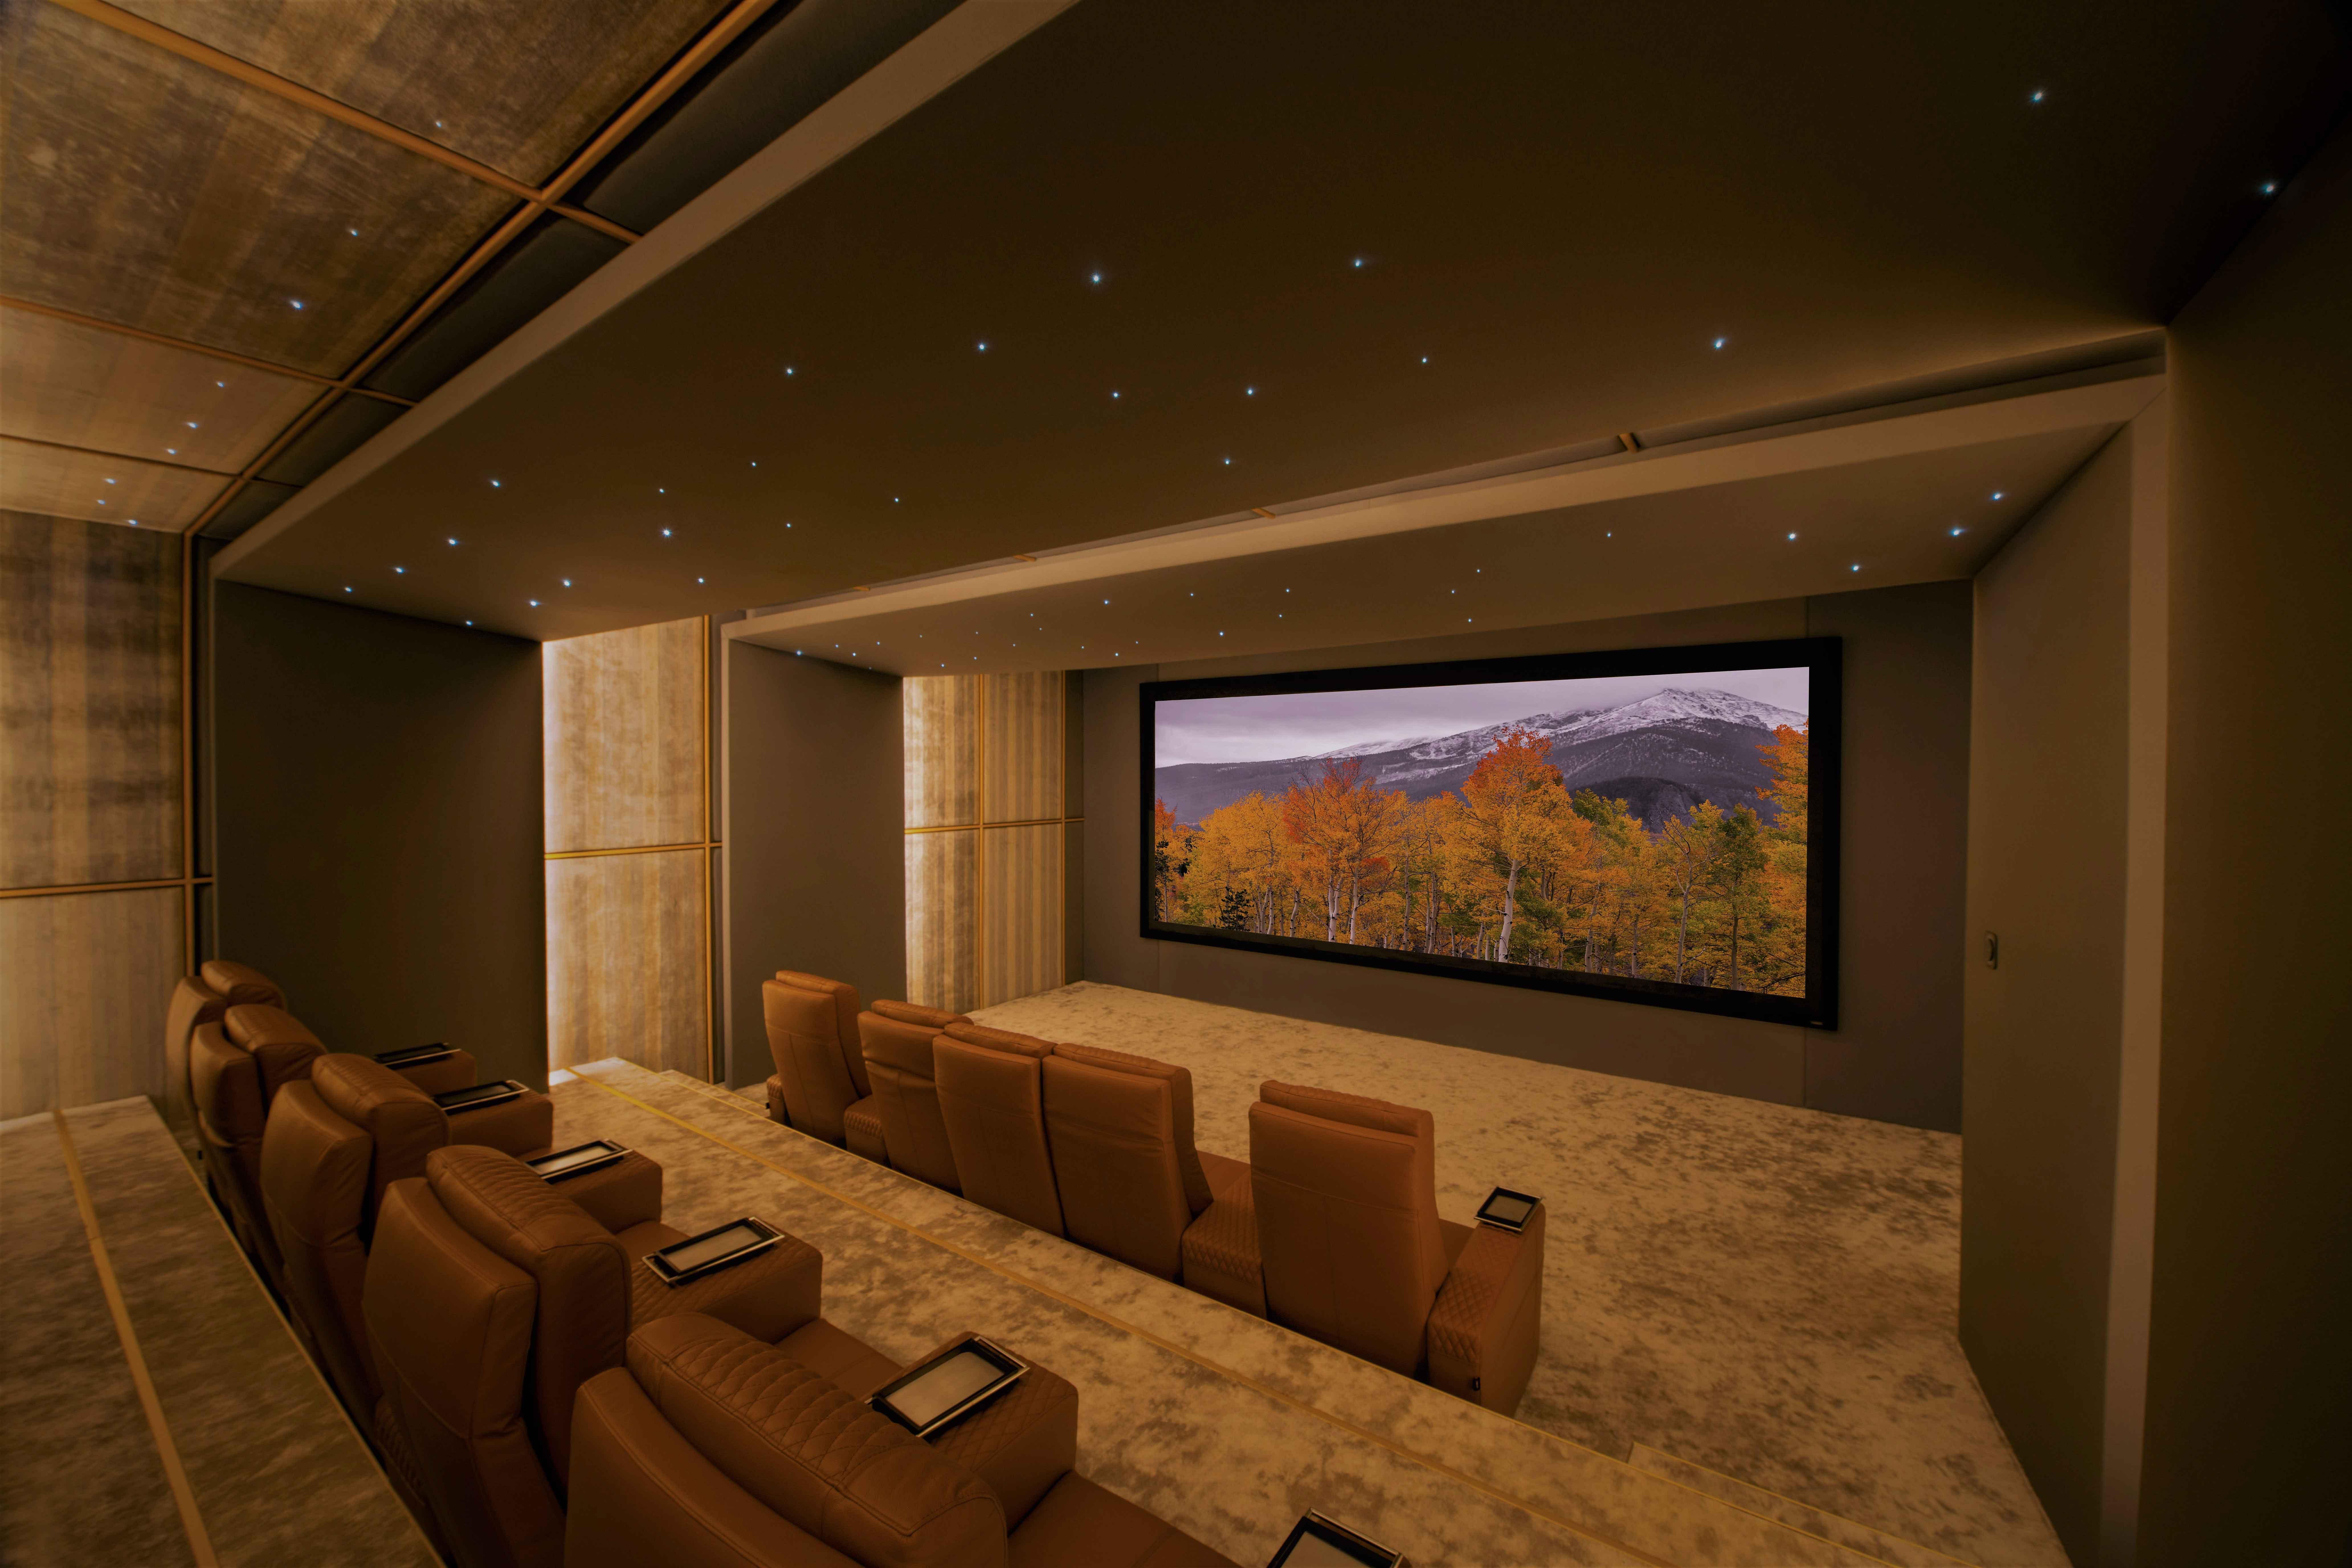 Home Theater ferrier seat cinema modern